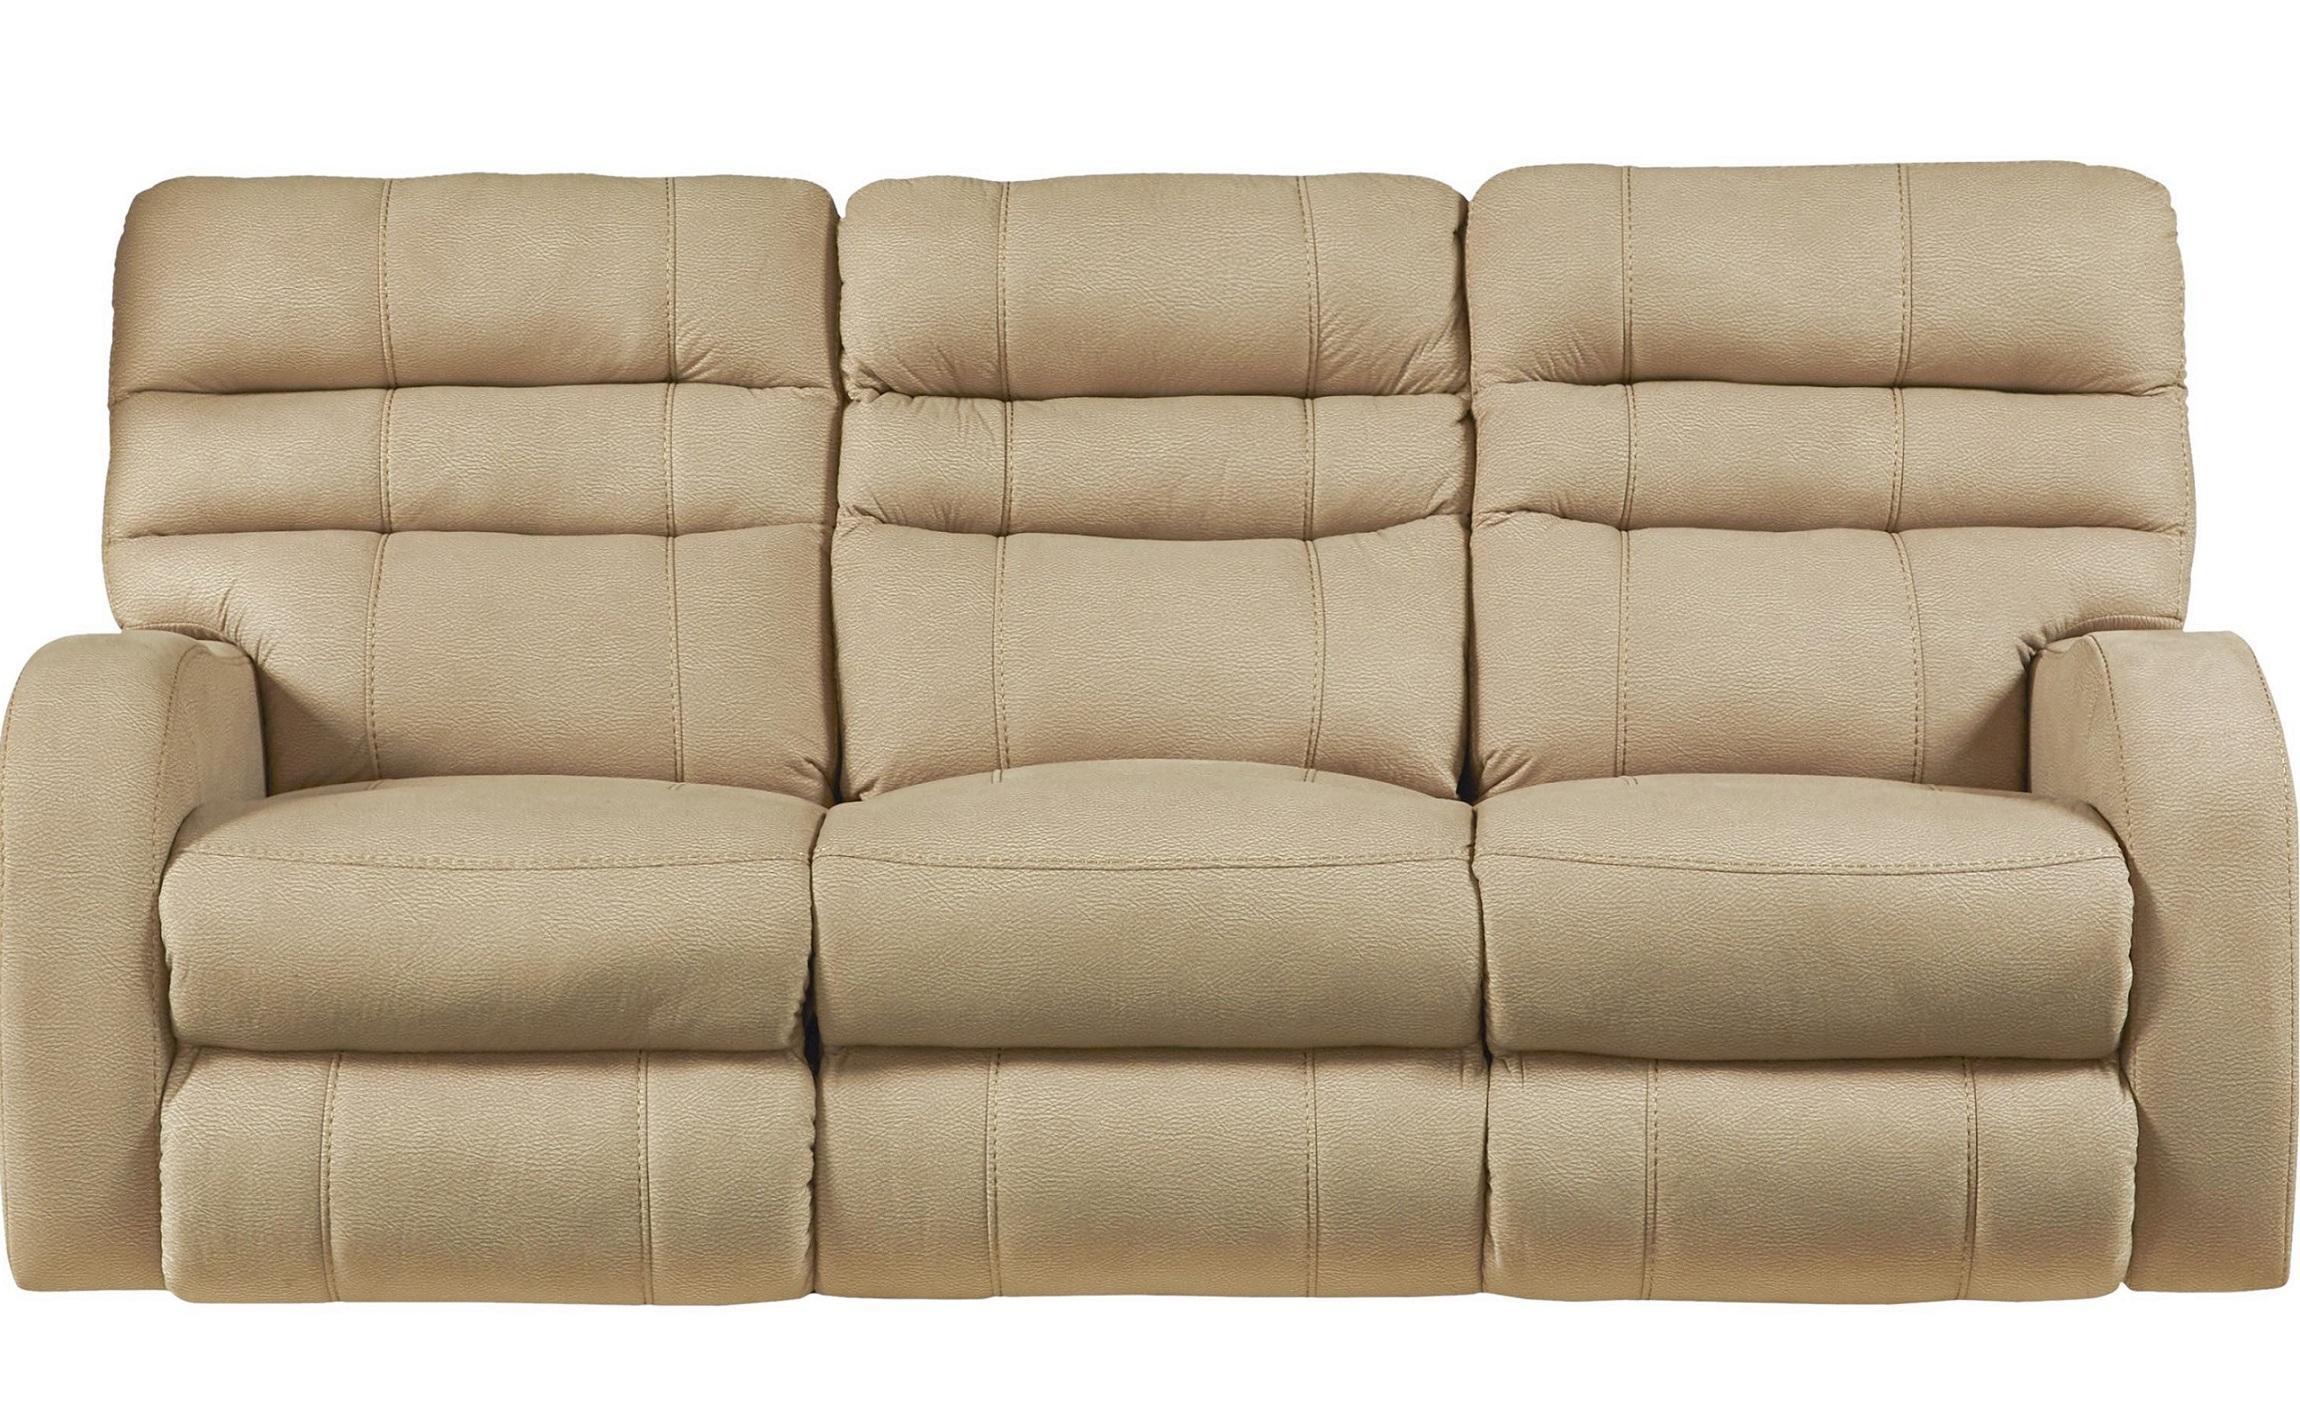 Kerry – Power Reclining Sofa – 61901 Sofas From Catnapper At Inside Catnapper Reclining Sofas (View 3 of 20)